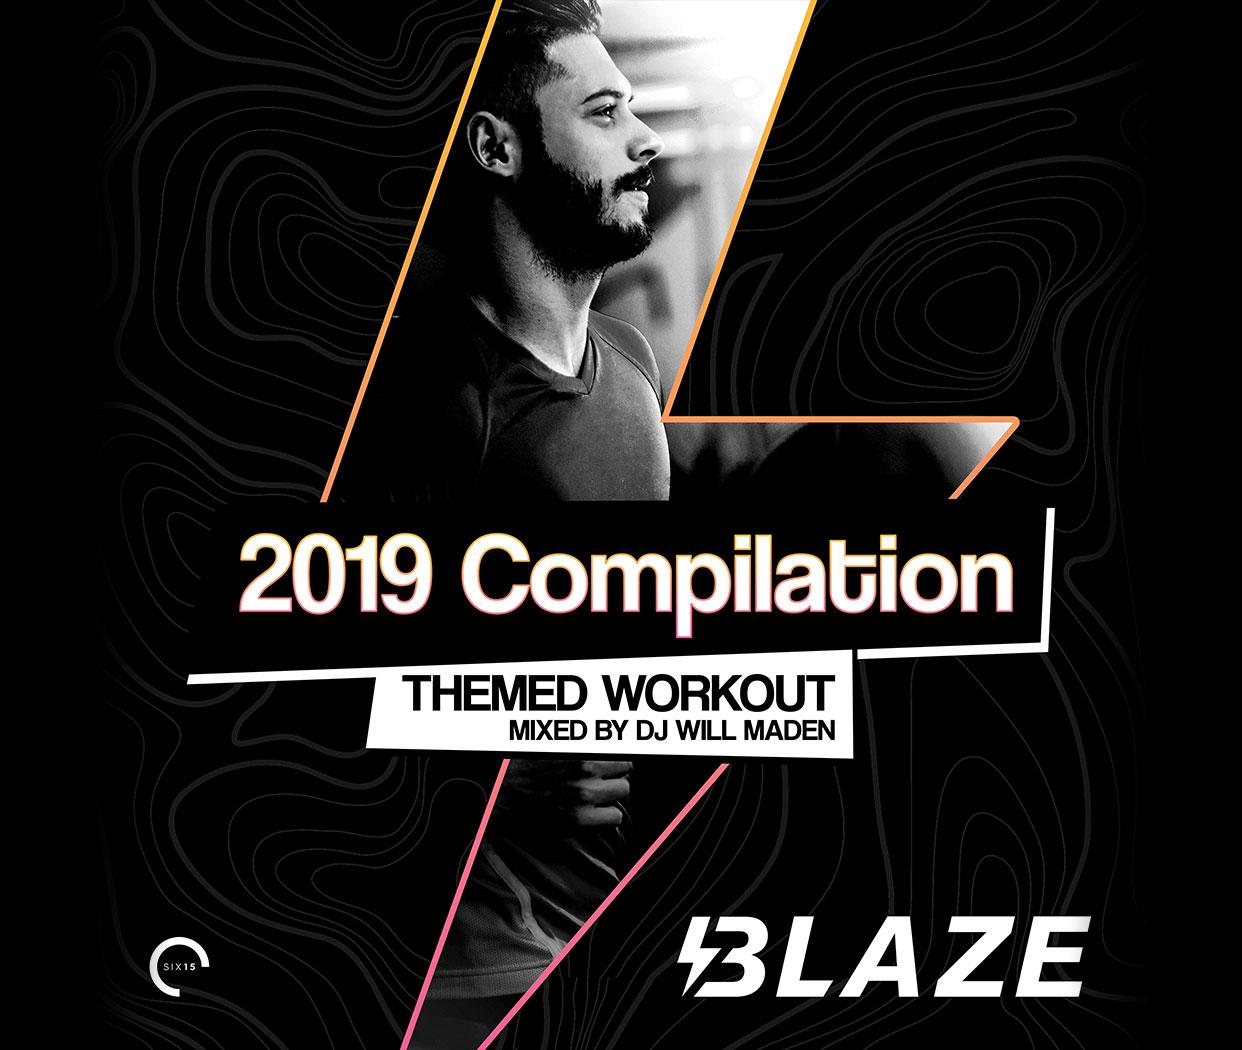 Blaze - 2019 Compilation!